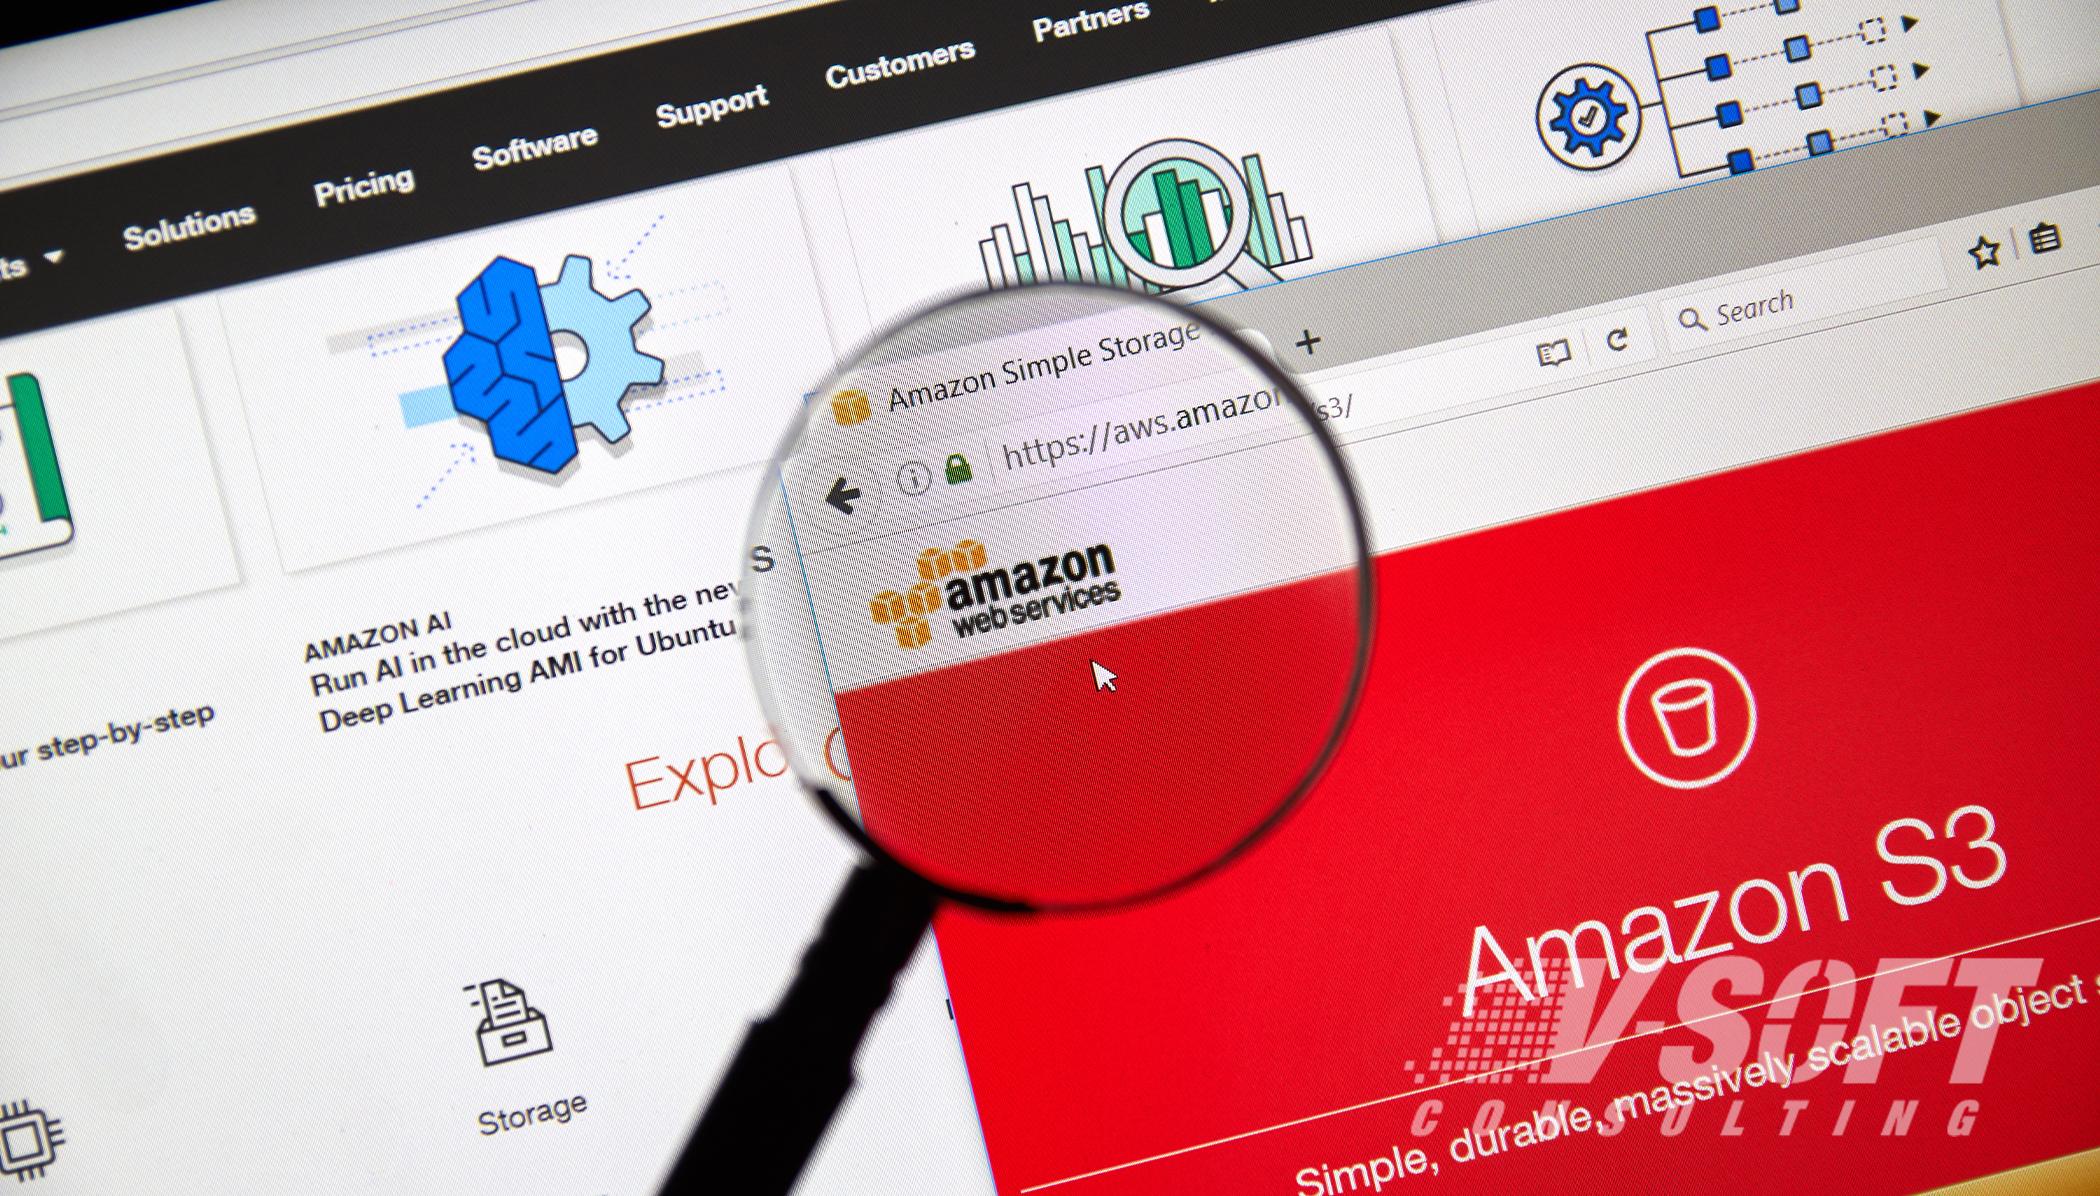 Amazon S3 cloud storage capabilities